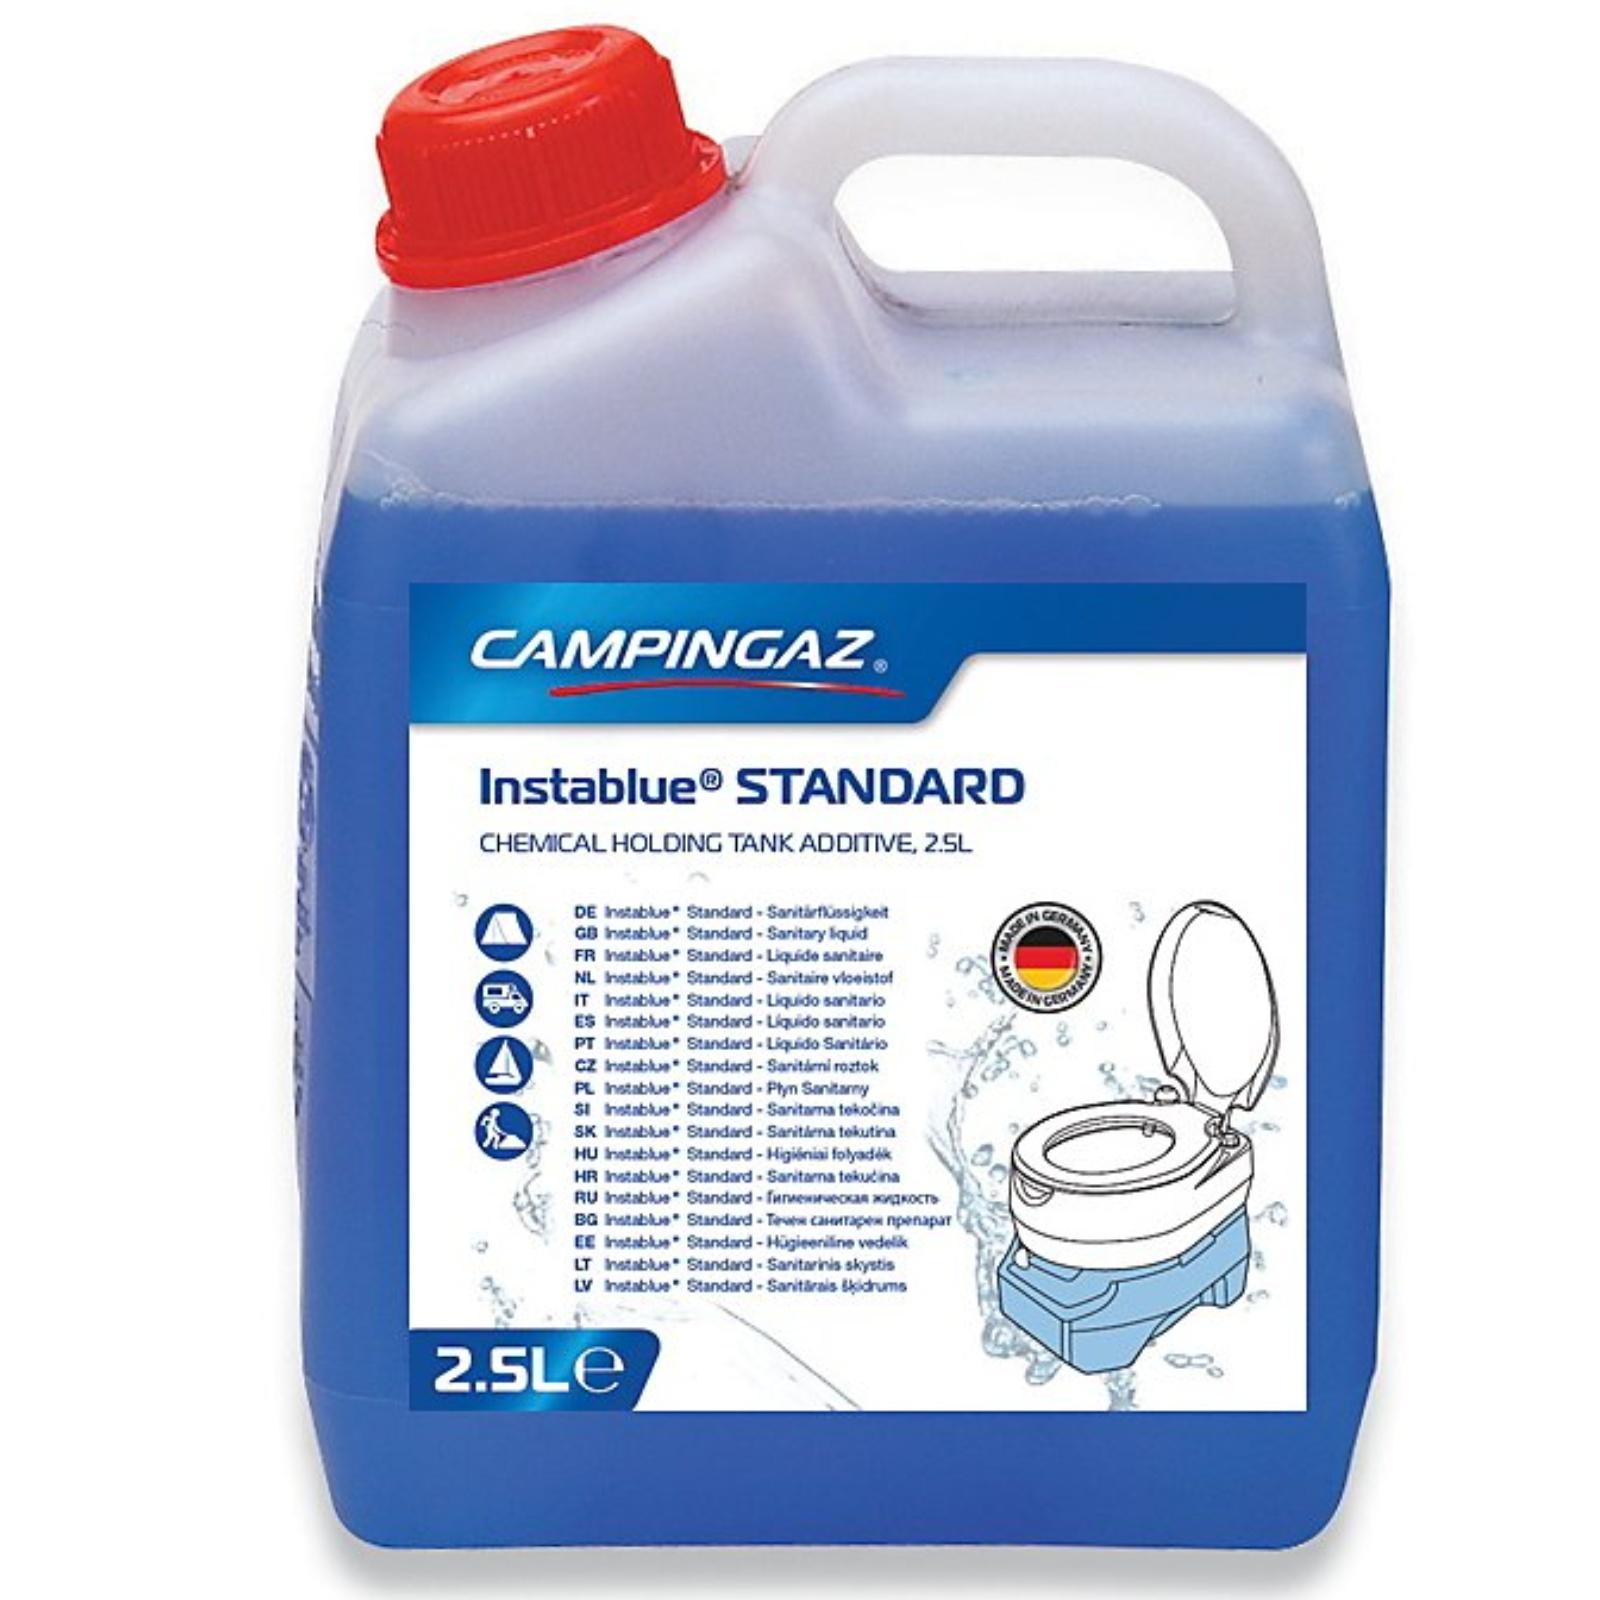 Campingaz INSTABLUE STANDARD 2.5L